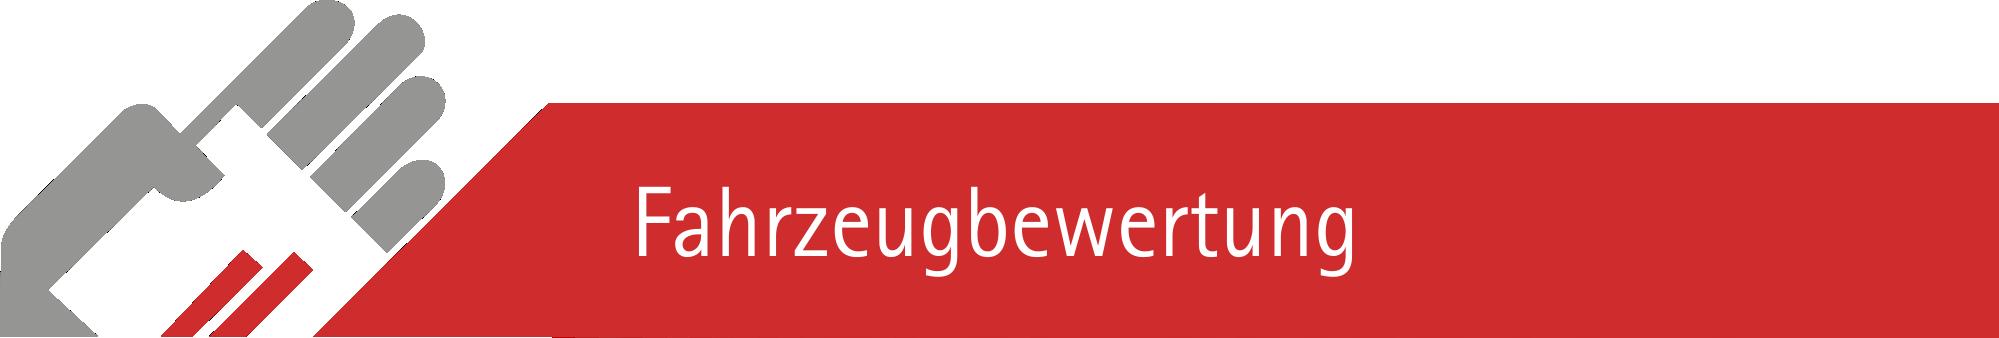 Härtner Gutachten Ingenieurbüro Saarbrücken